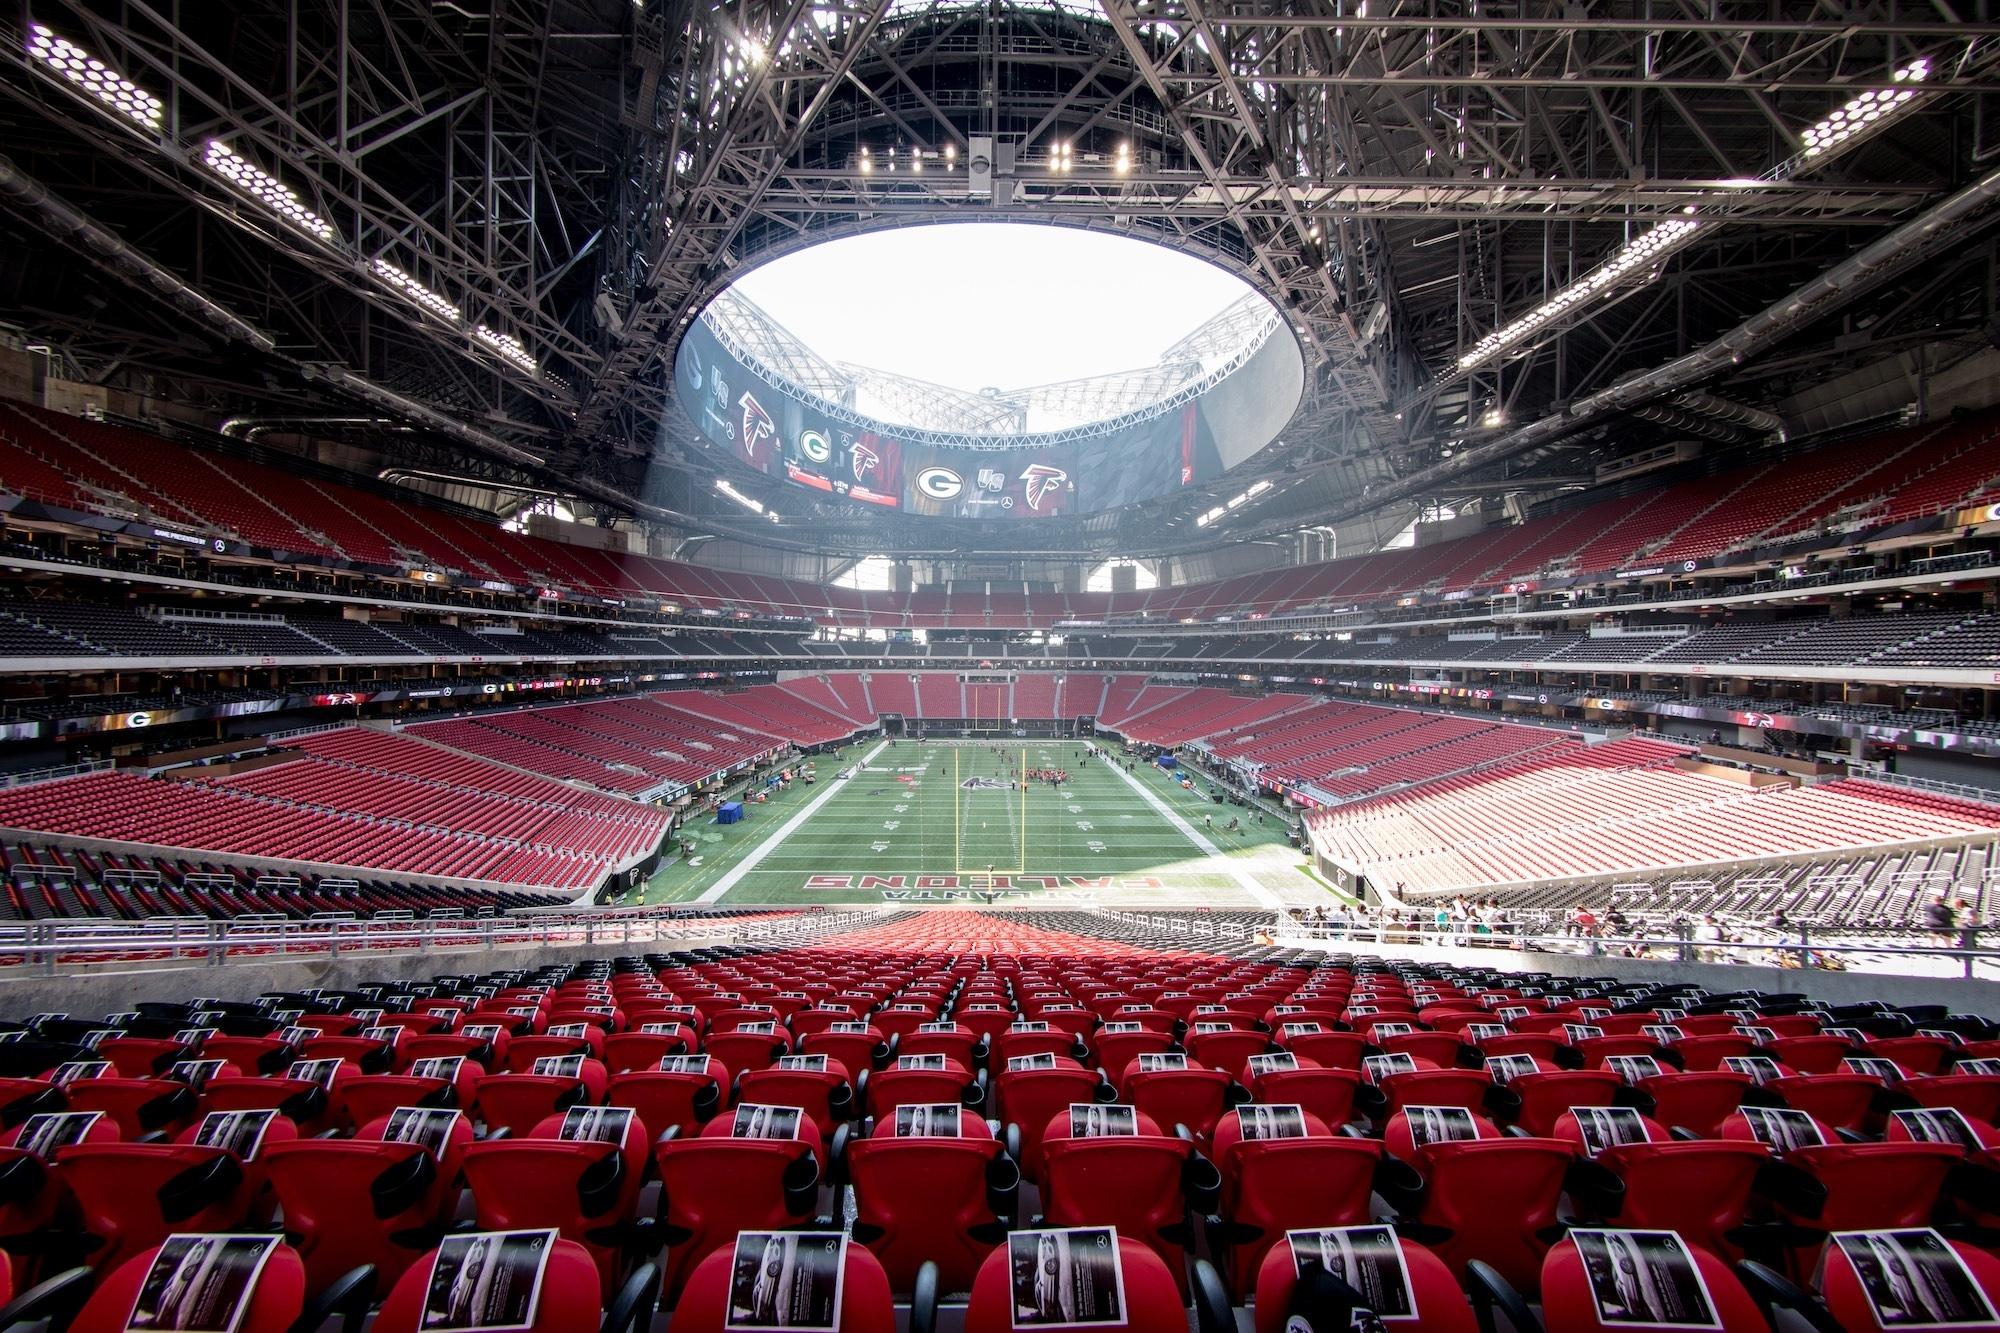 Atlanta Super Bowl Liii Host Committee Announces Official with regard to Super Bowl Live Atlanta Map